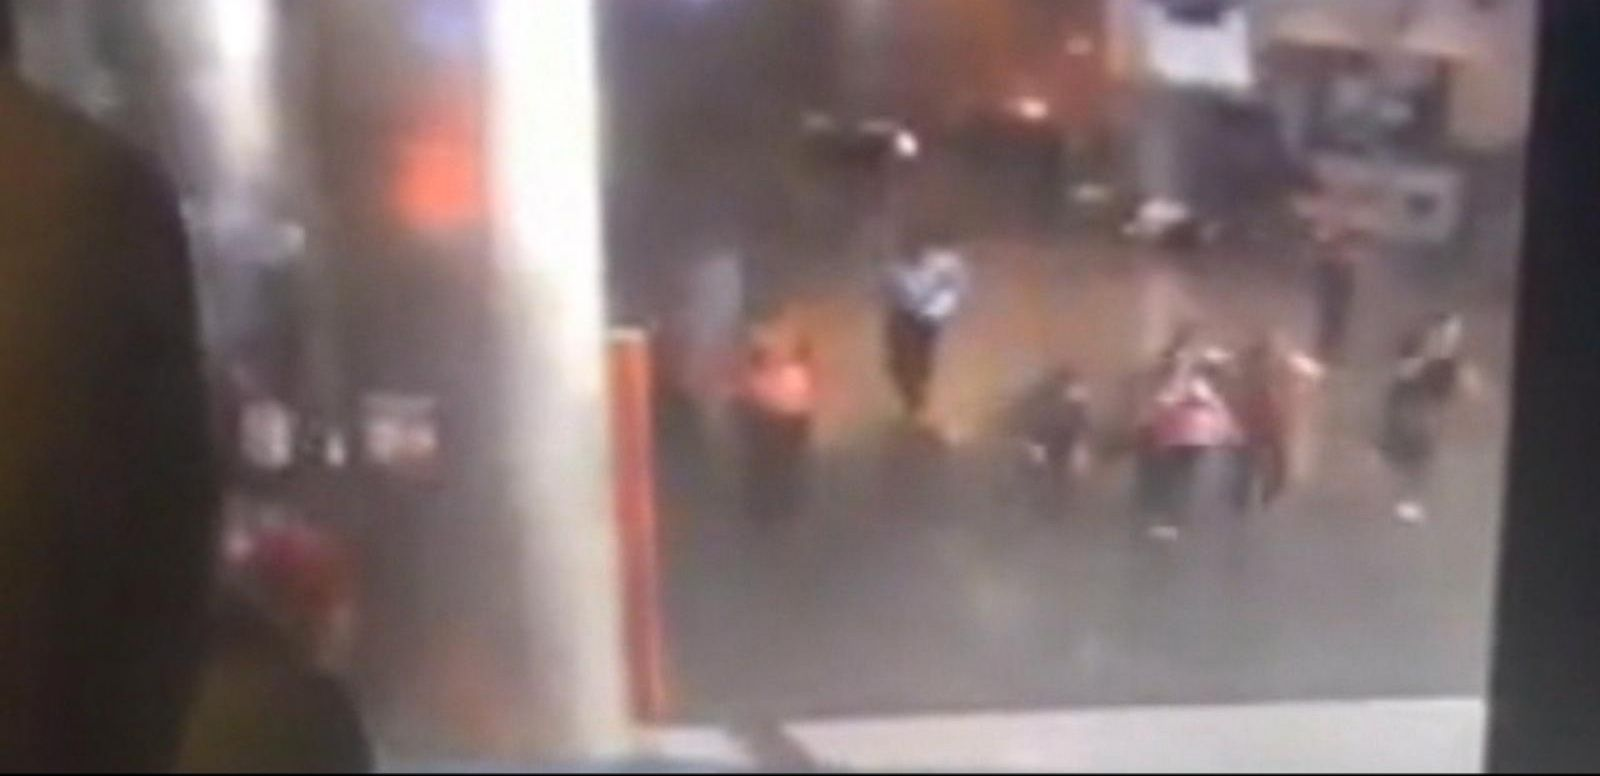 Dozens Killed in Terrorist Attack at Istanbul Airport